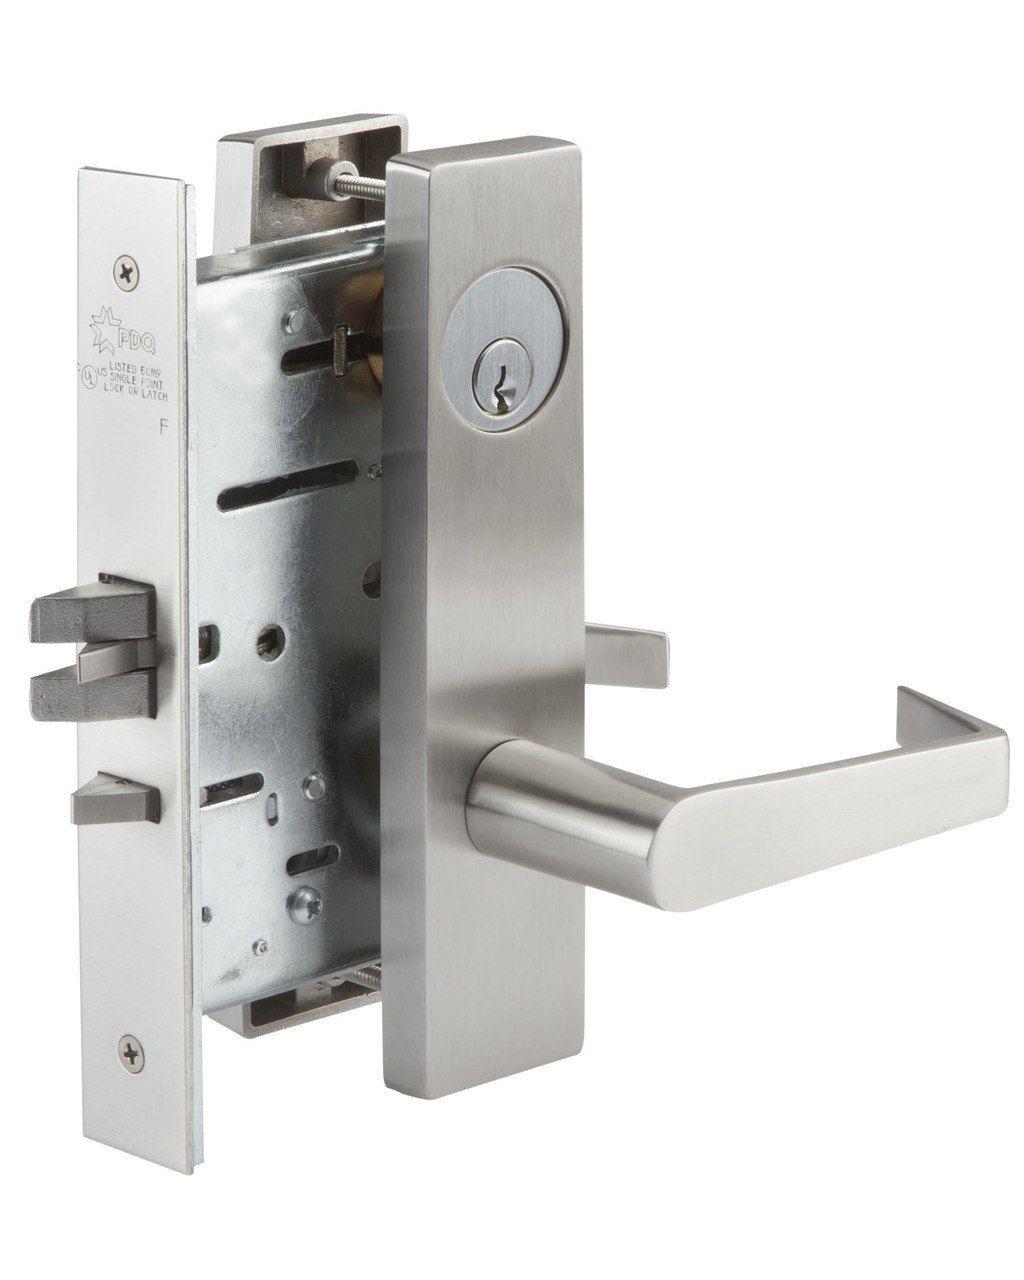 Pdq Mr116ej Mortise Lock Single Cylinder Entry Function Lock Mortise Lock Commercial Door Hardware Door Hardware Accessories